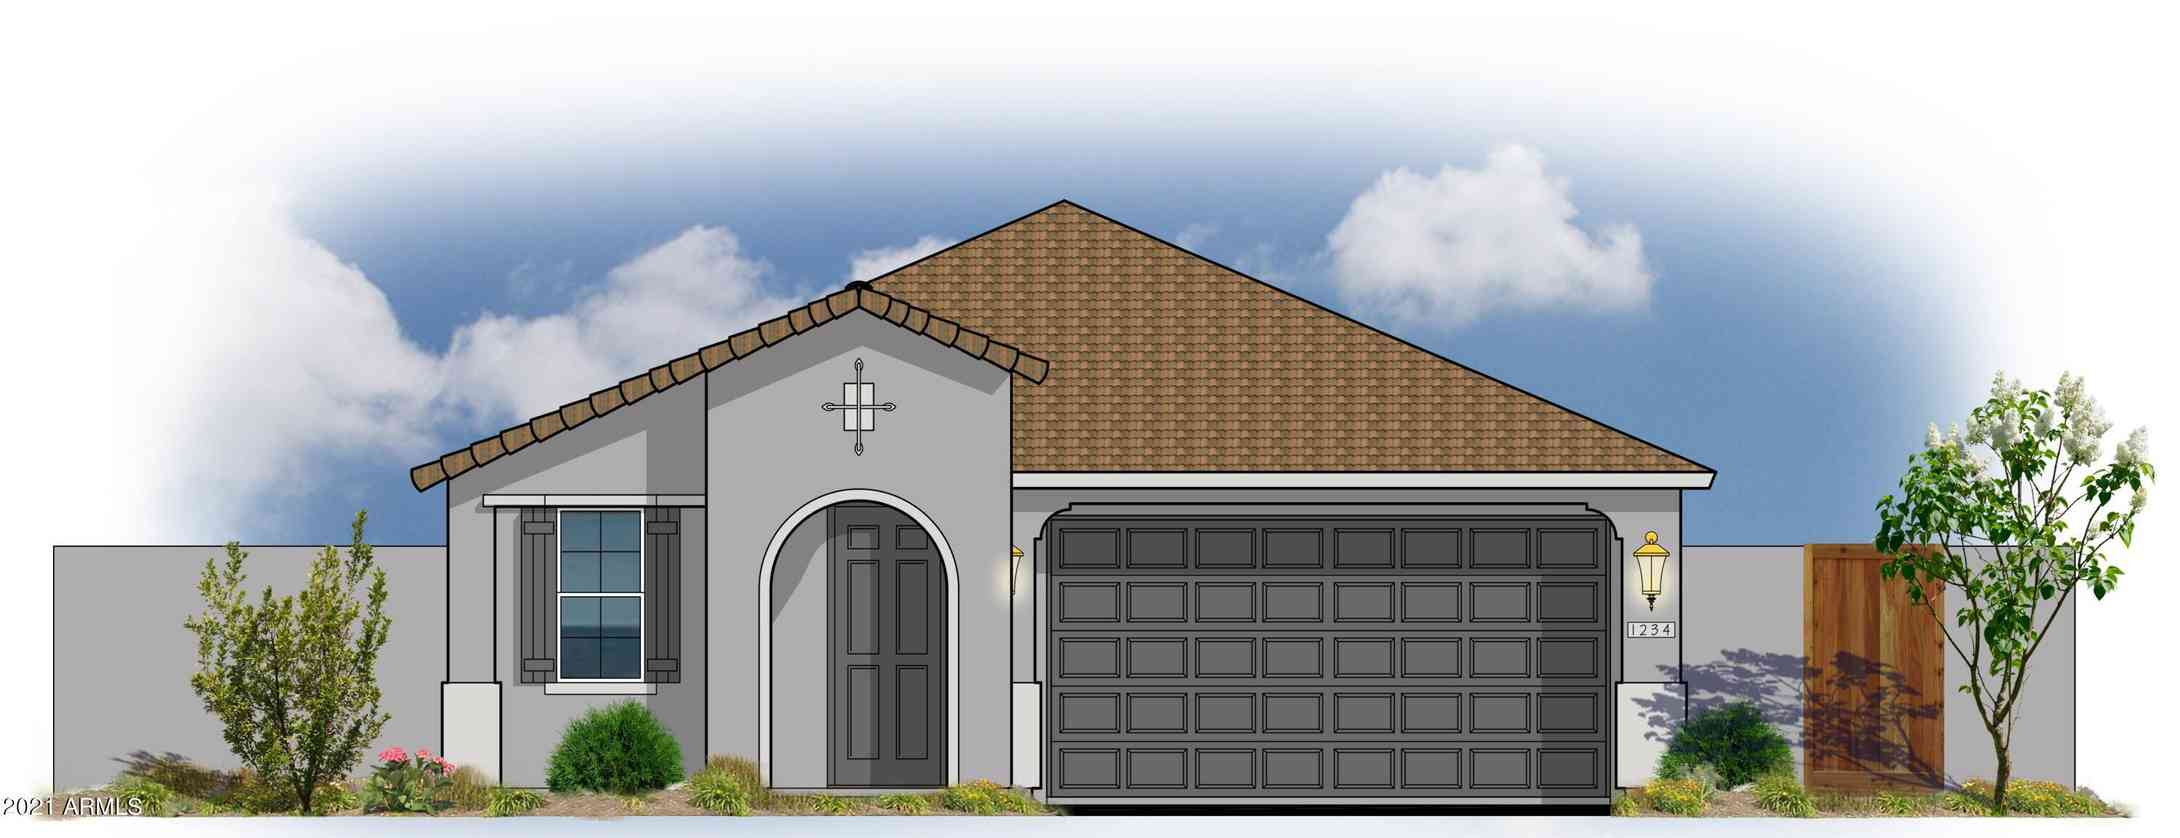 8443 W MEDLOCK Drive, Glendale, AZ, 85305,